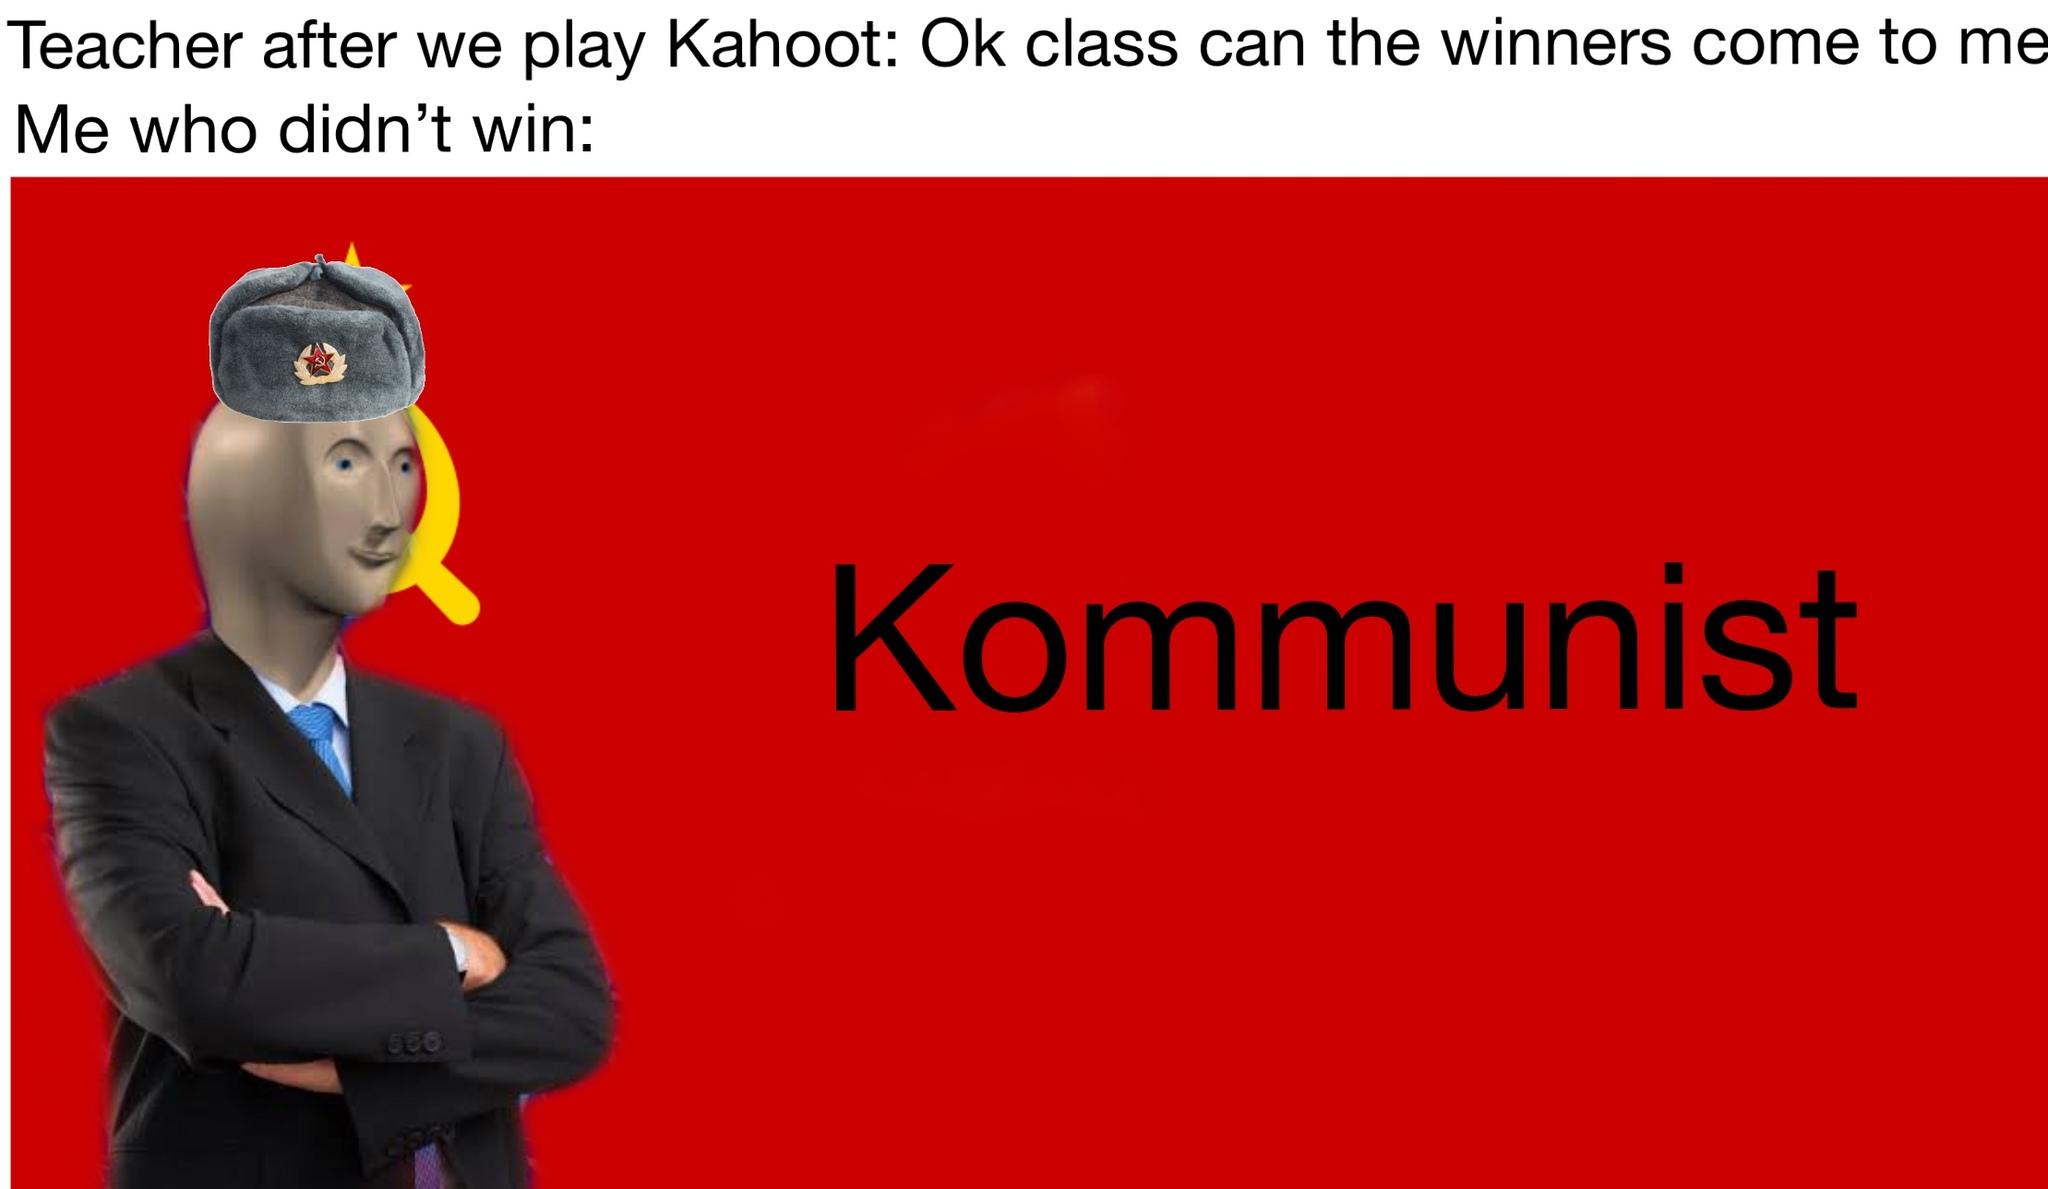 Kommunist - meme